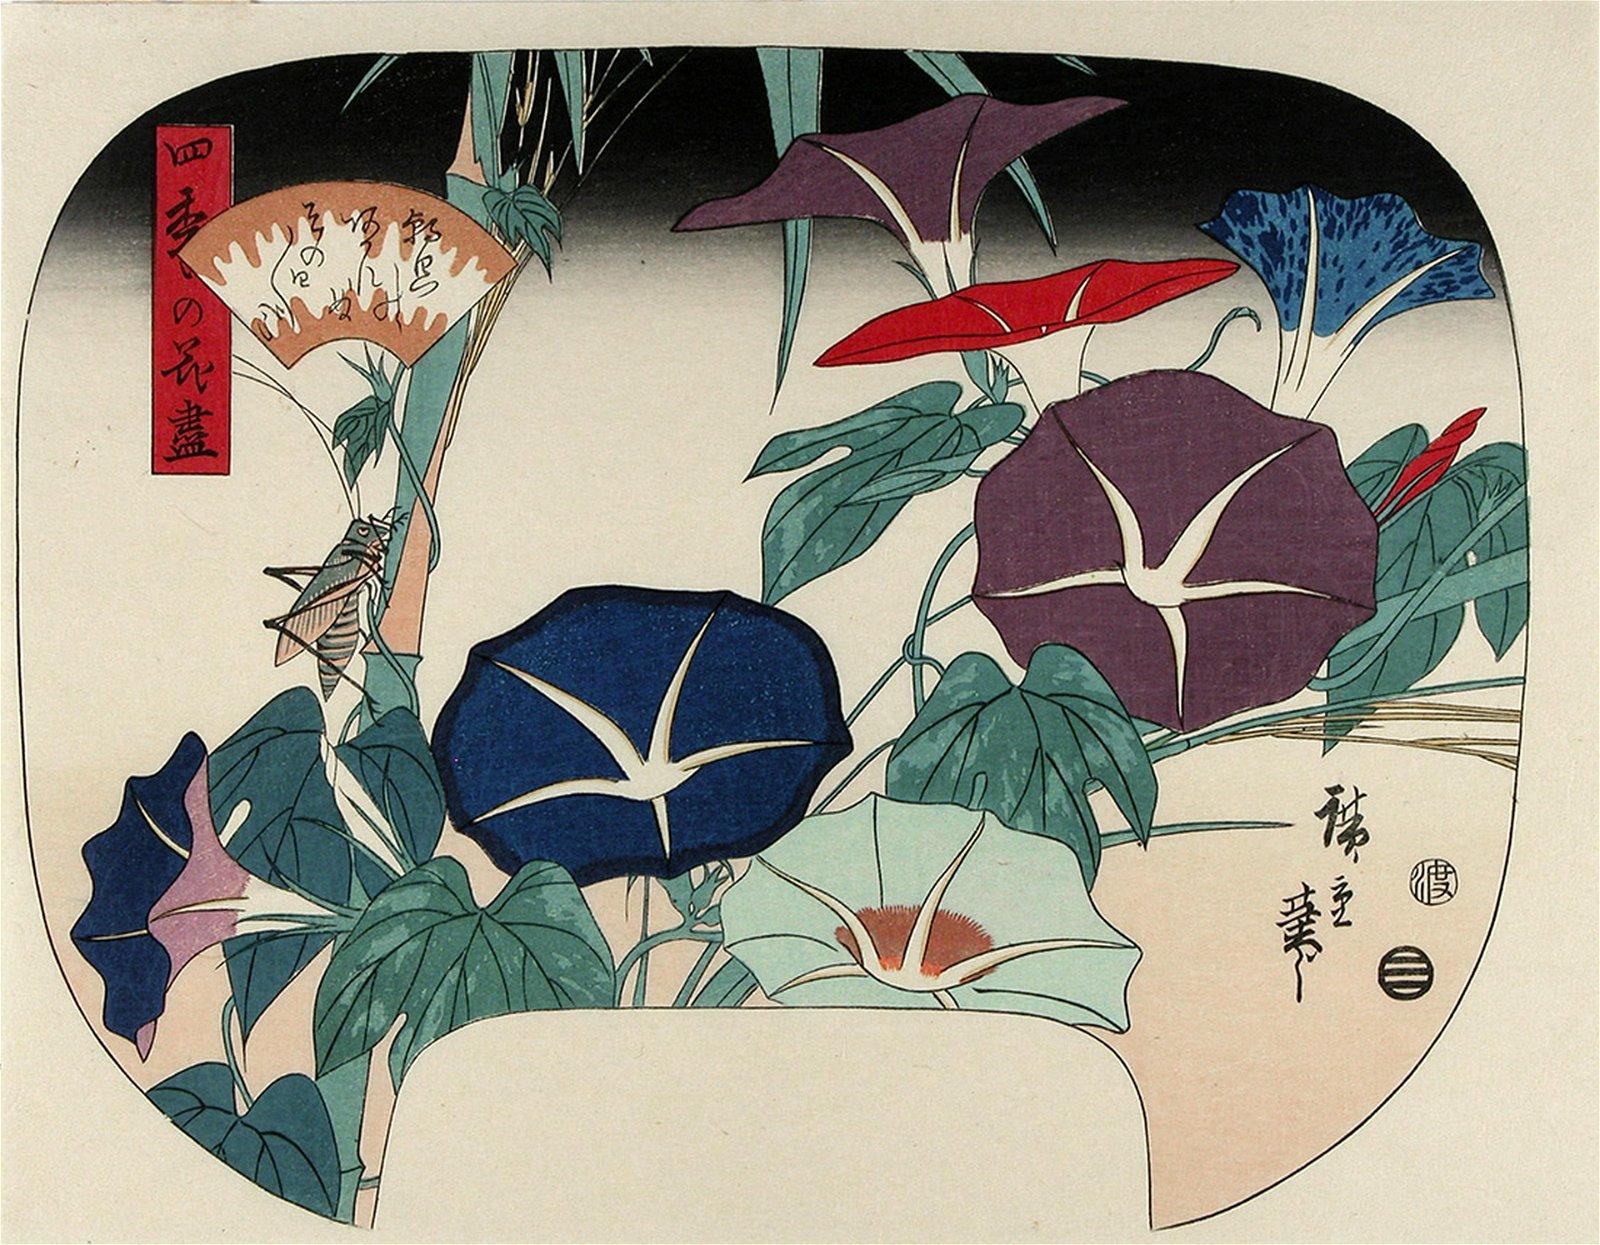 HIROSHIGE, Utagawa (1797-1858): Morning Glories and